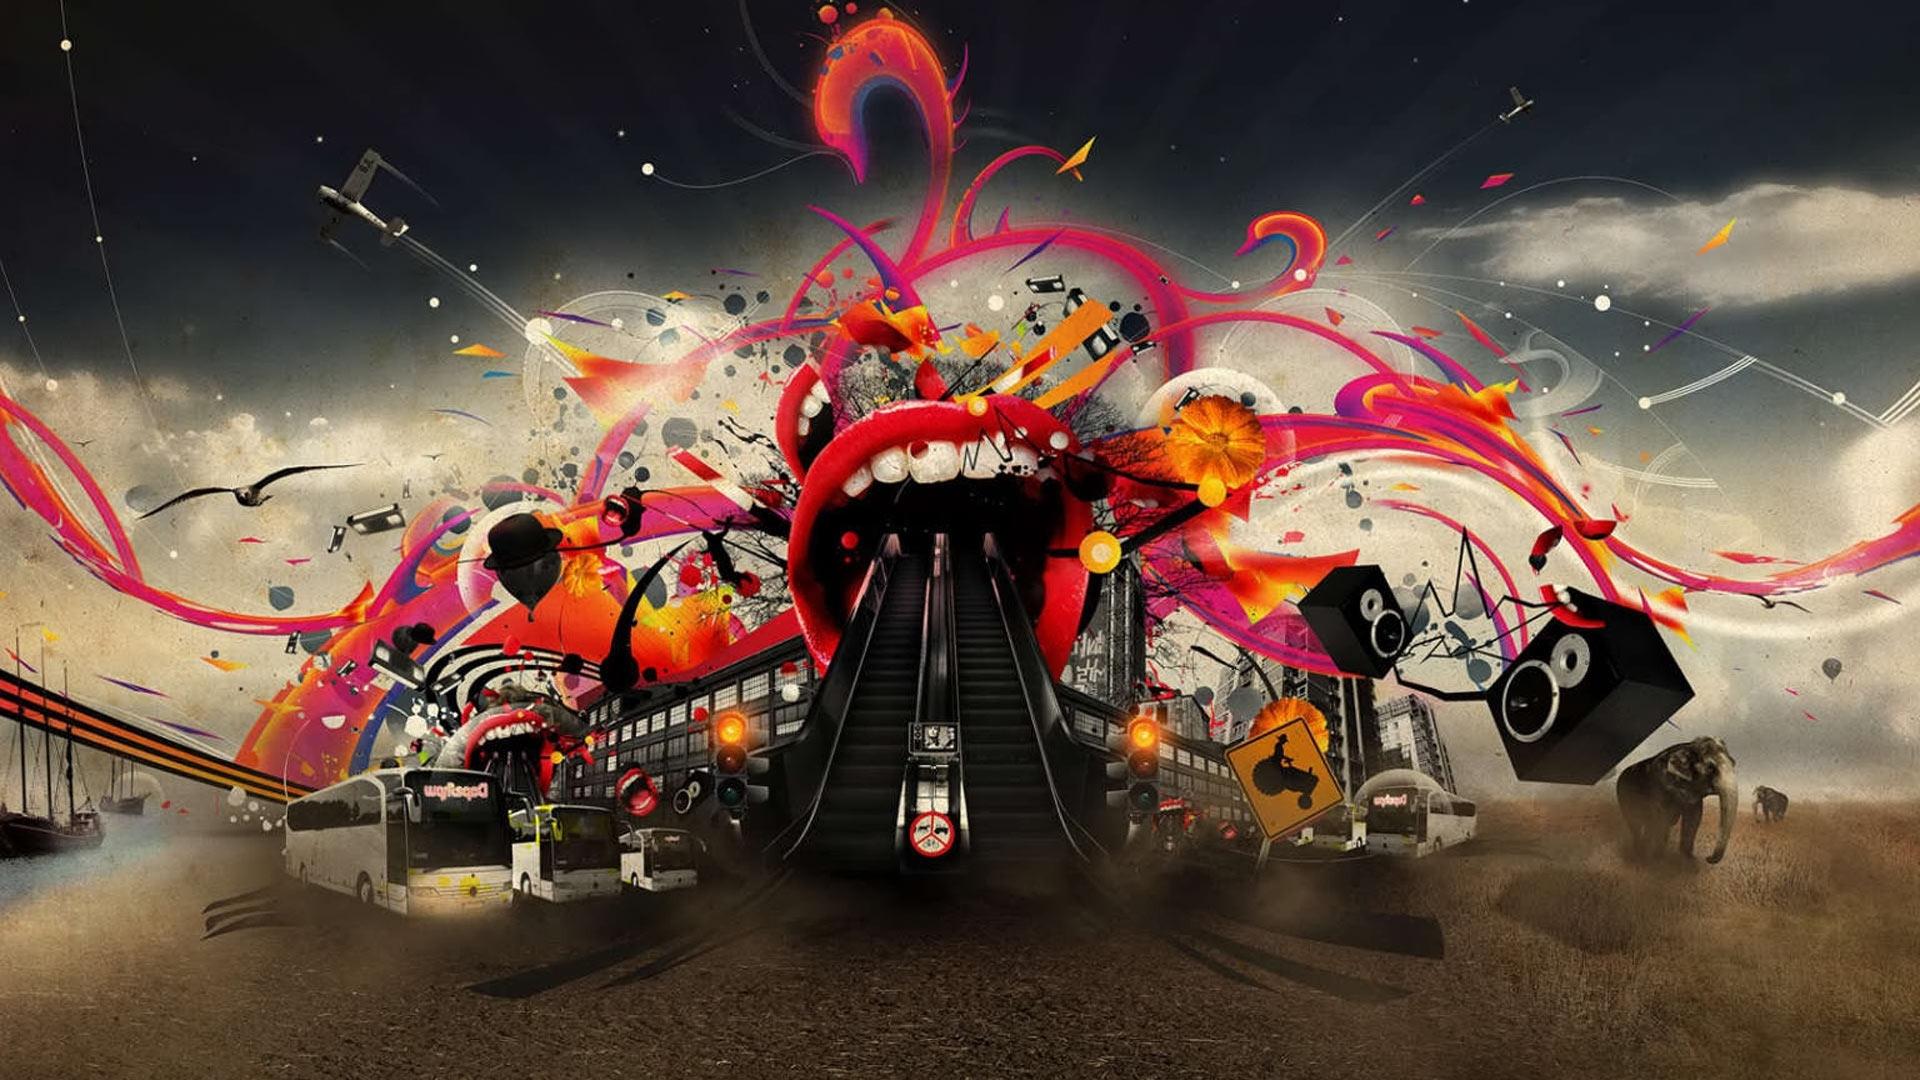 loud concert 1080p hd wallpaper music | ВСЯКО РАЗНО | pinterest | hd